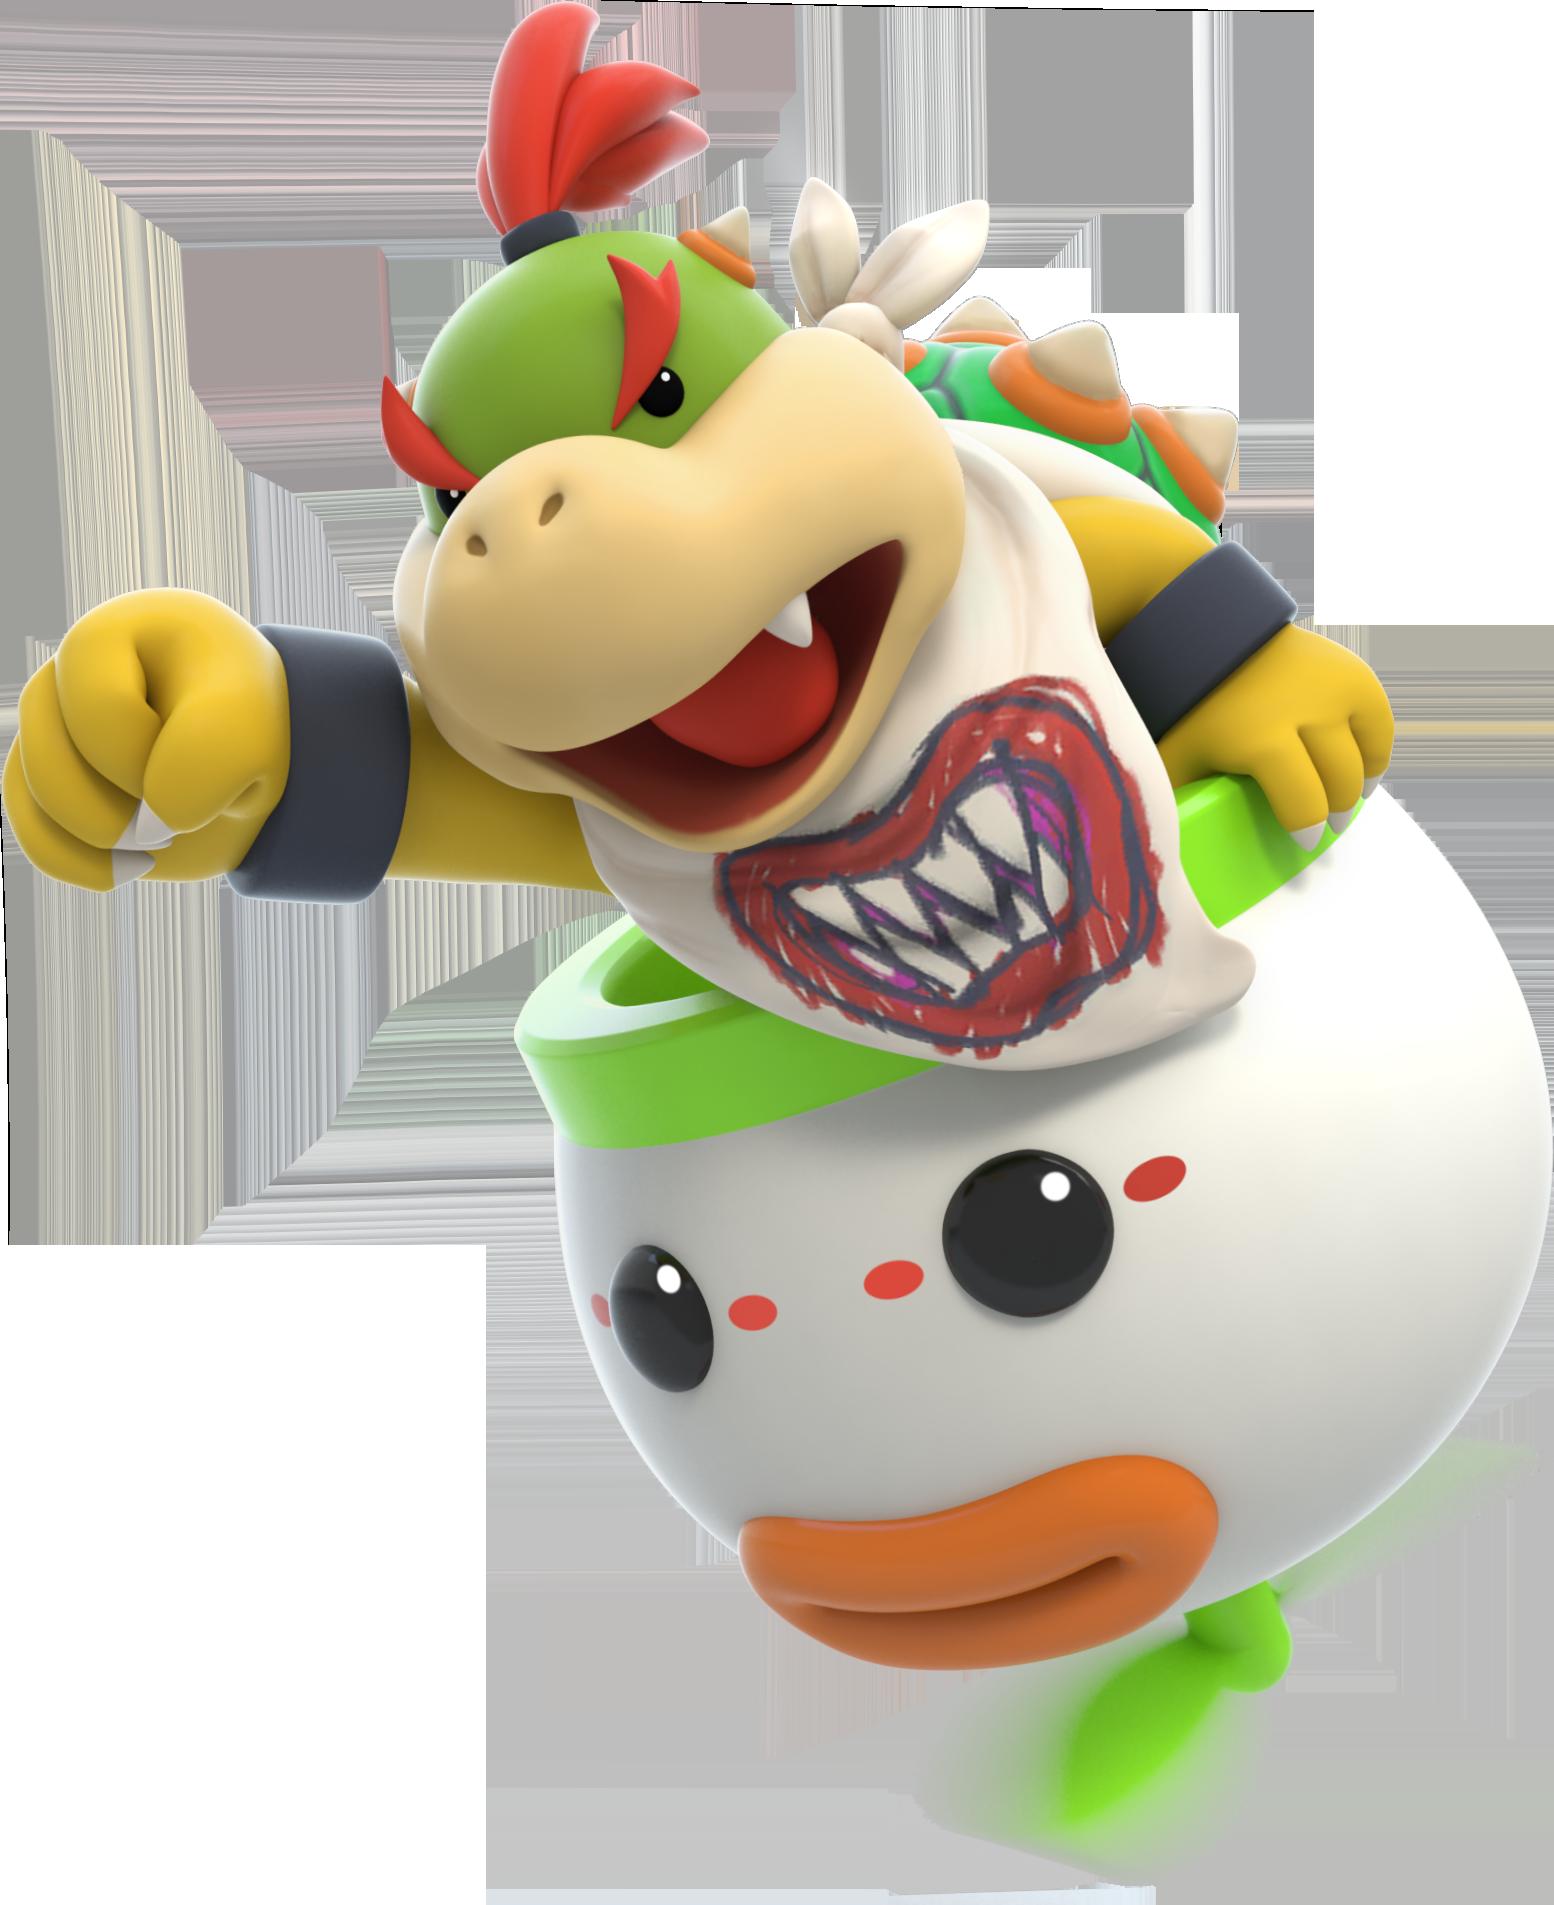 Bowser Jr. | Super Mario Wiki | FANDOM powered by Wikia